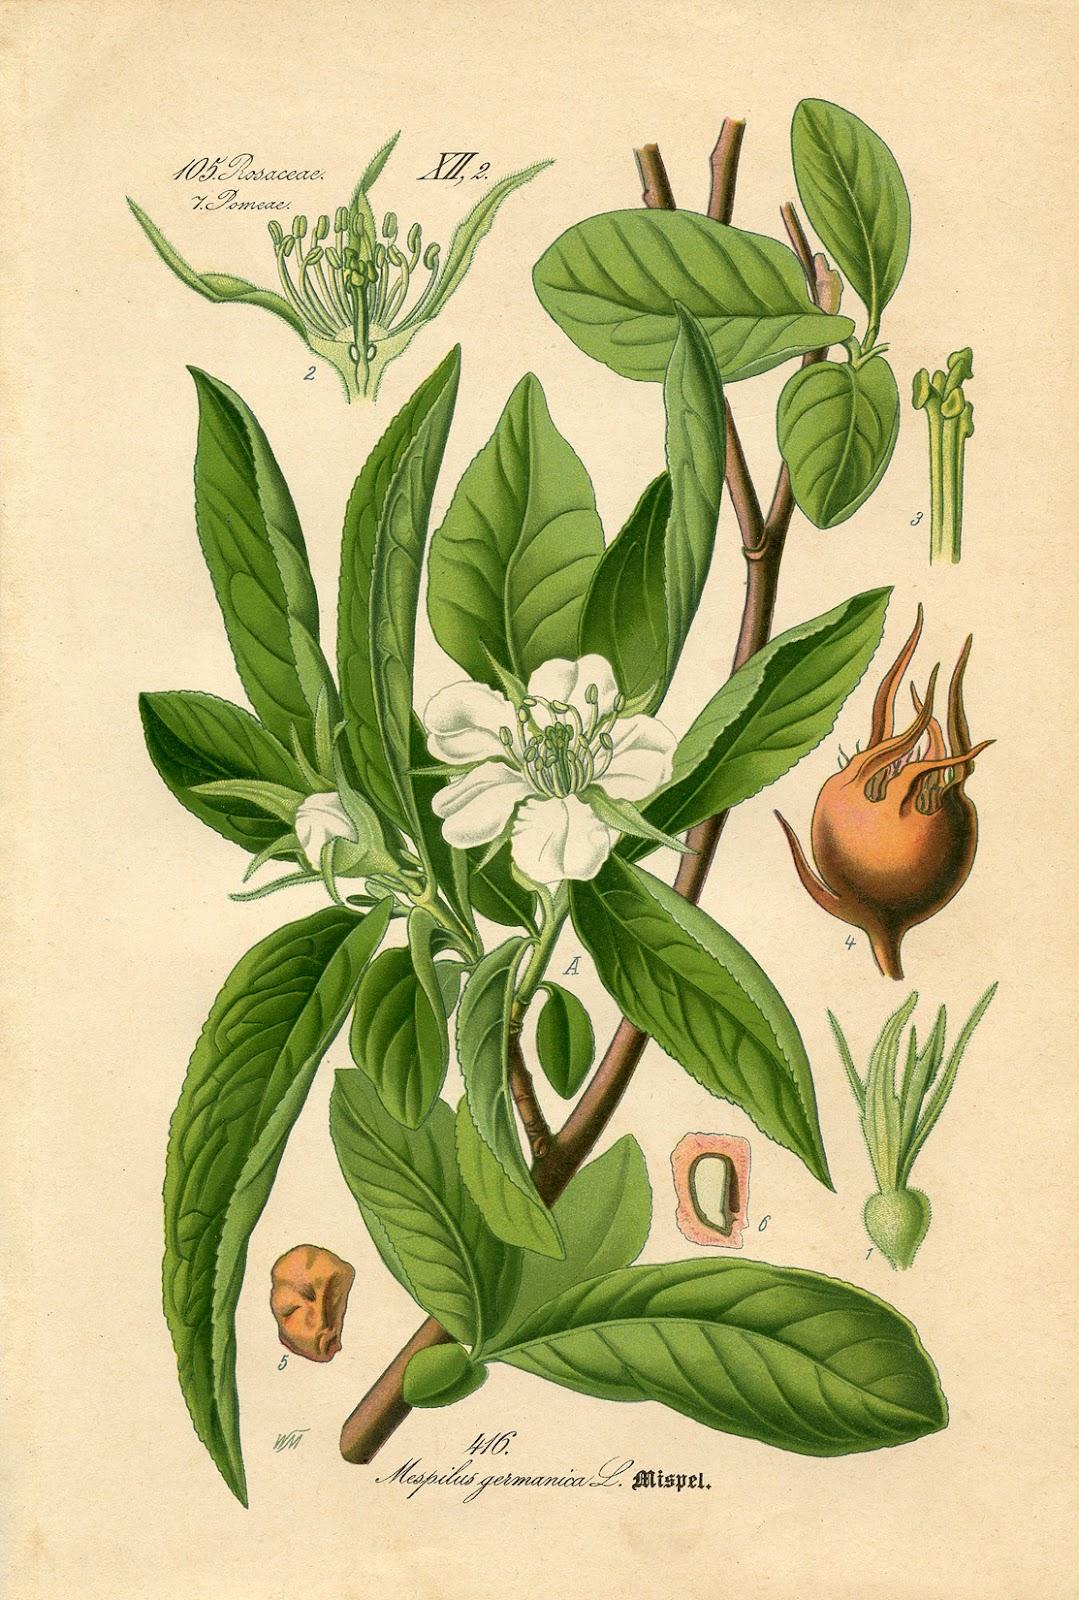 http://1.bp.blogspot.com/-oKUqT6j88qg/T8gSyDWU9_I/AAAAAAAASFA/AzmzM4HKAvk/s1600/Botanical-Printable-GraphicsFairy22sm.jpg